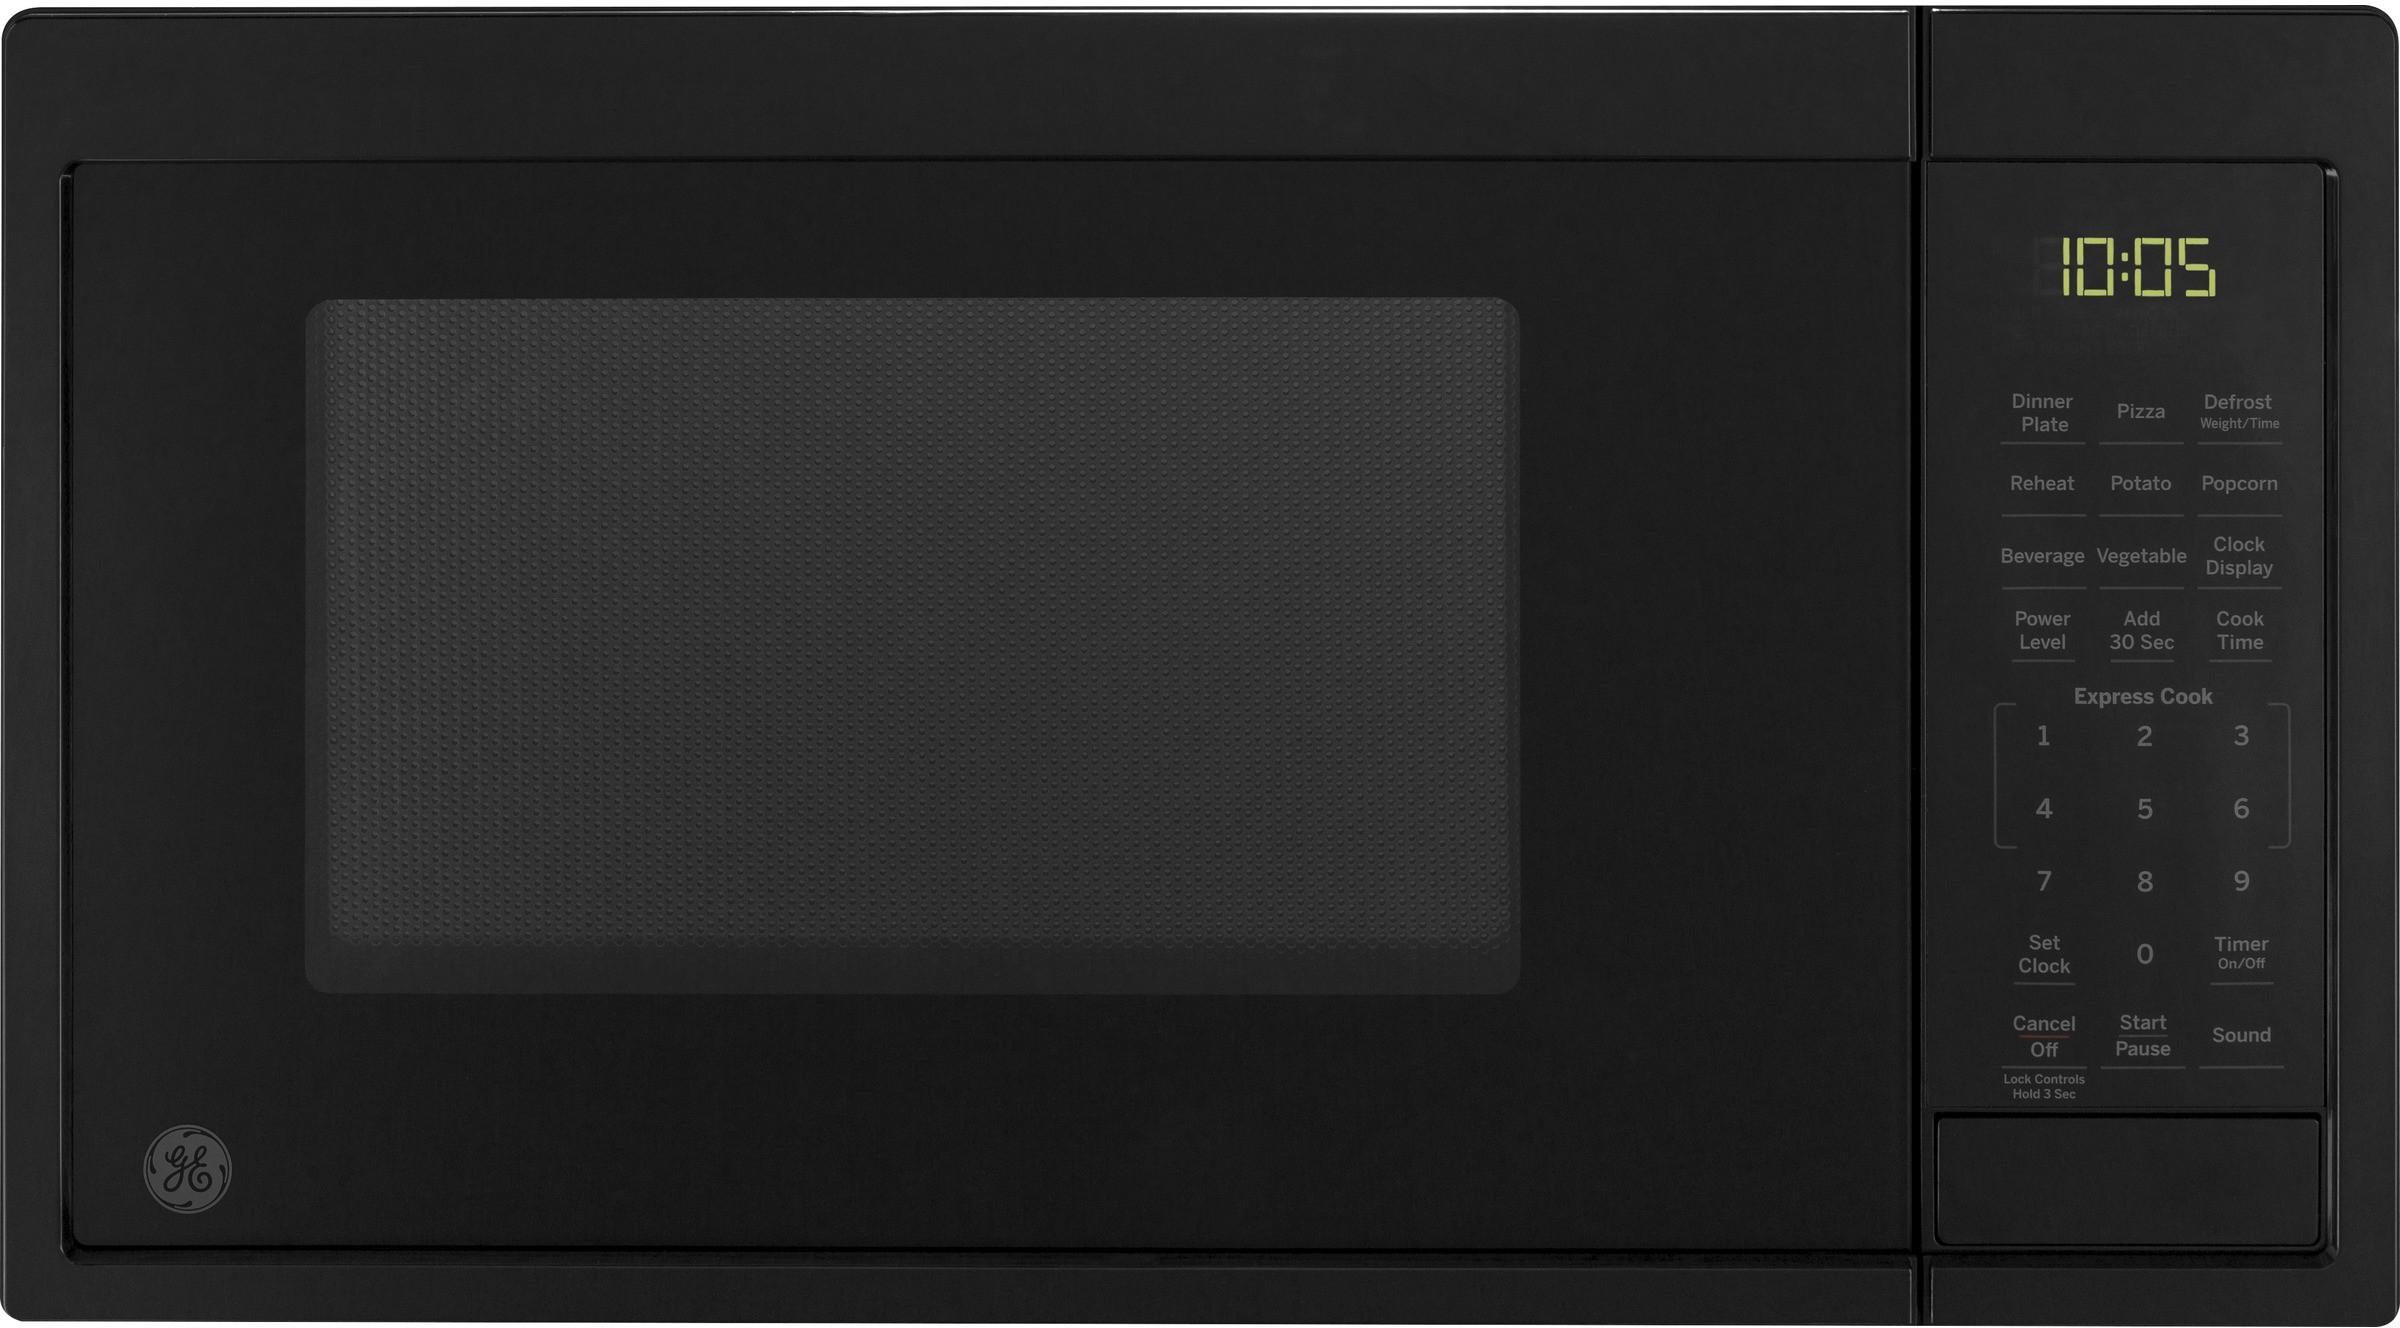 ge 0 9 cu ft countertop microwave oven